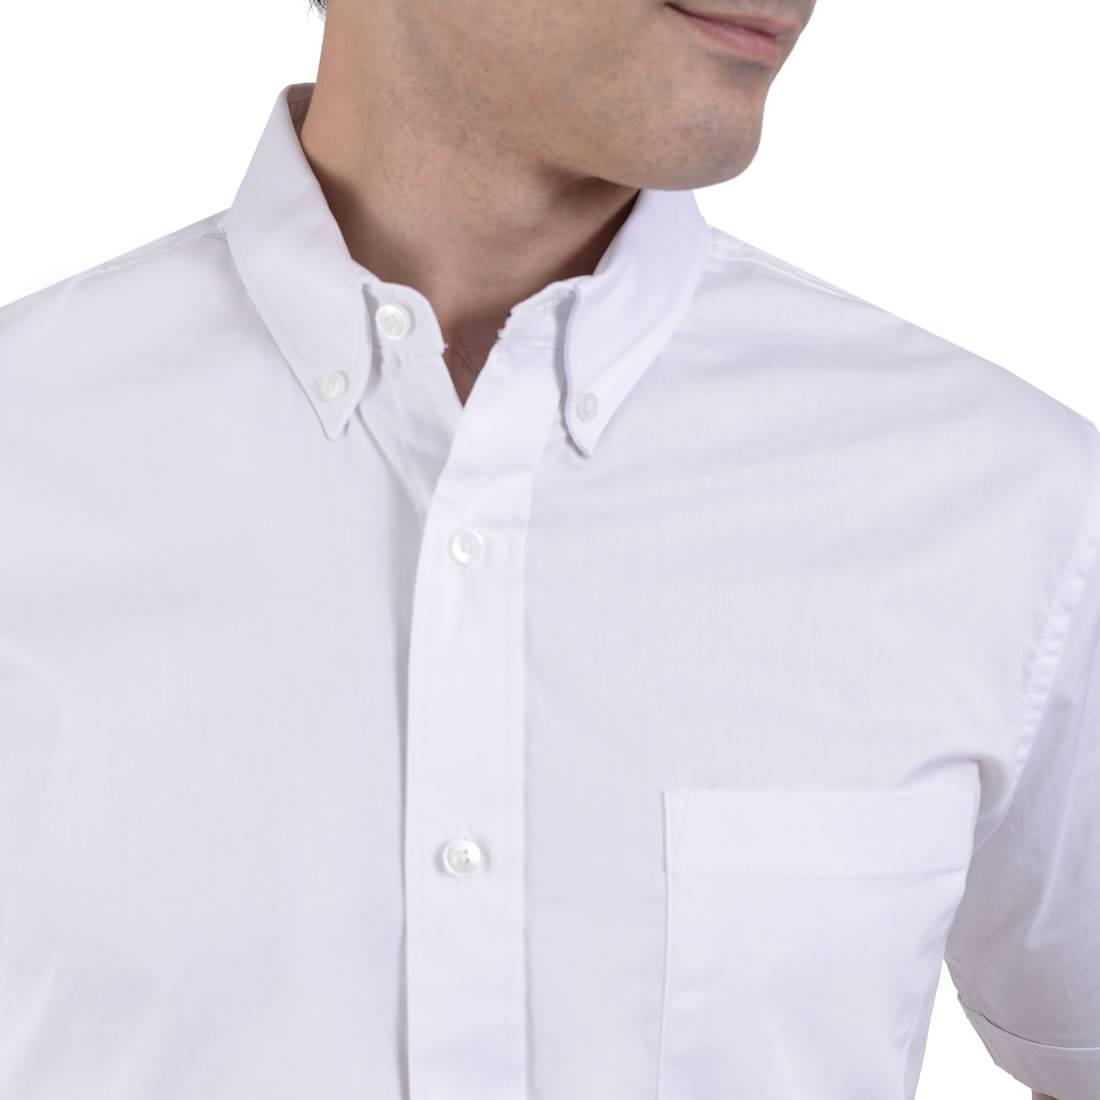 042331381702-04-Camisa-Manga-Corta-classic-Fit-Blanco-yale